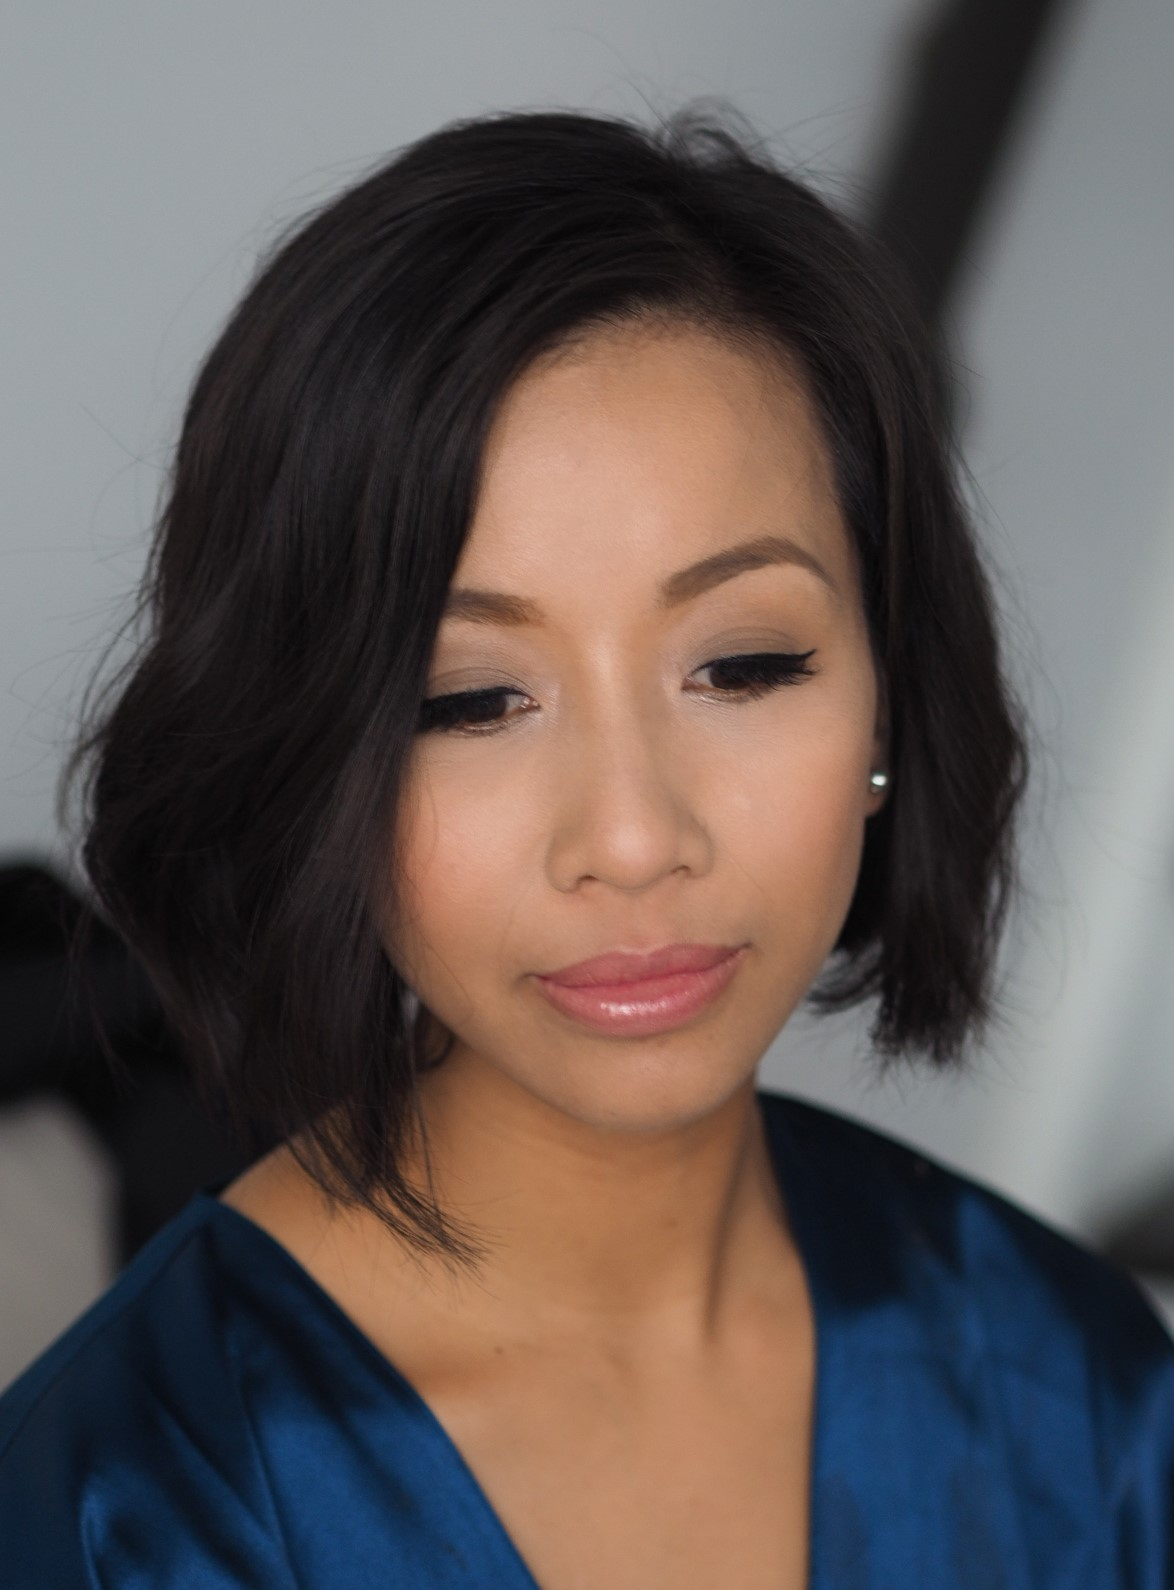 makeup lashes toronto artist mua